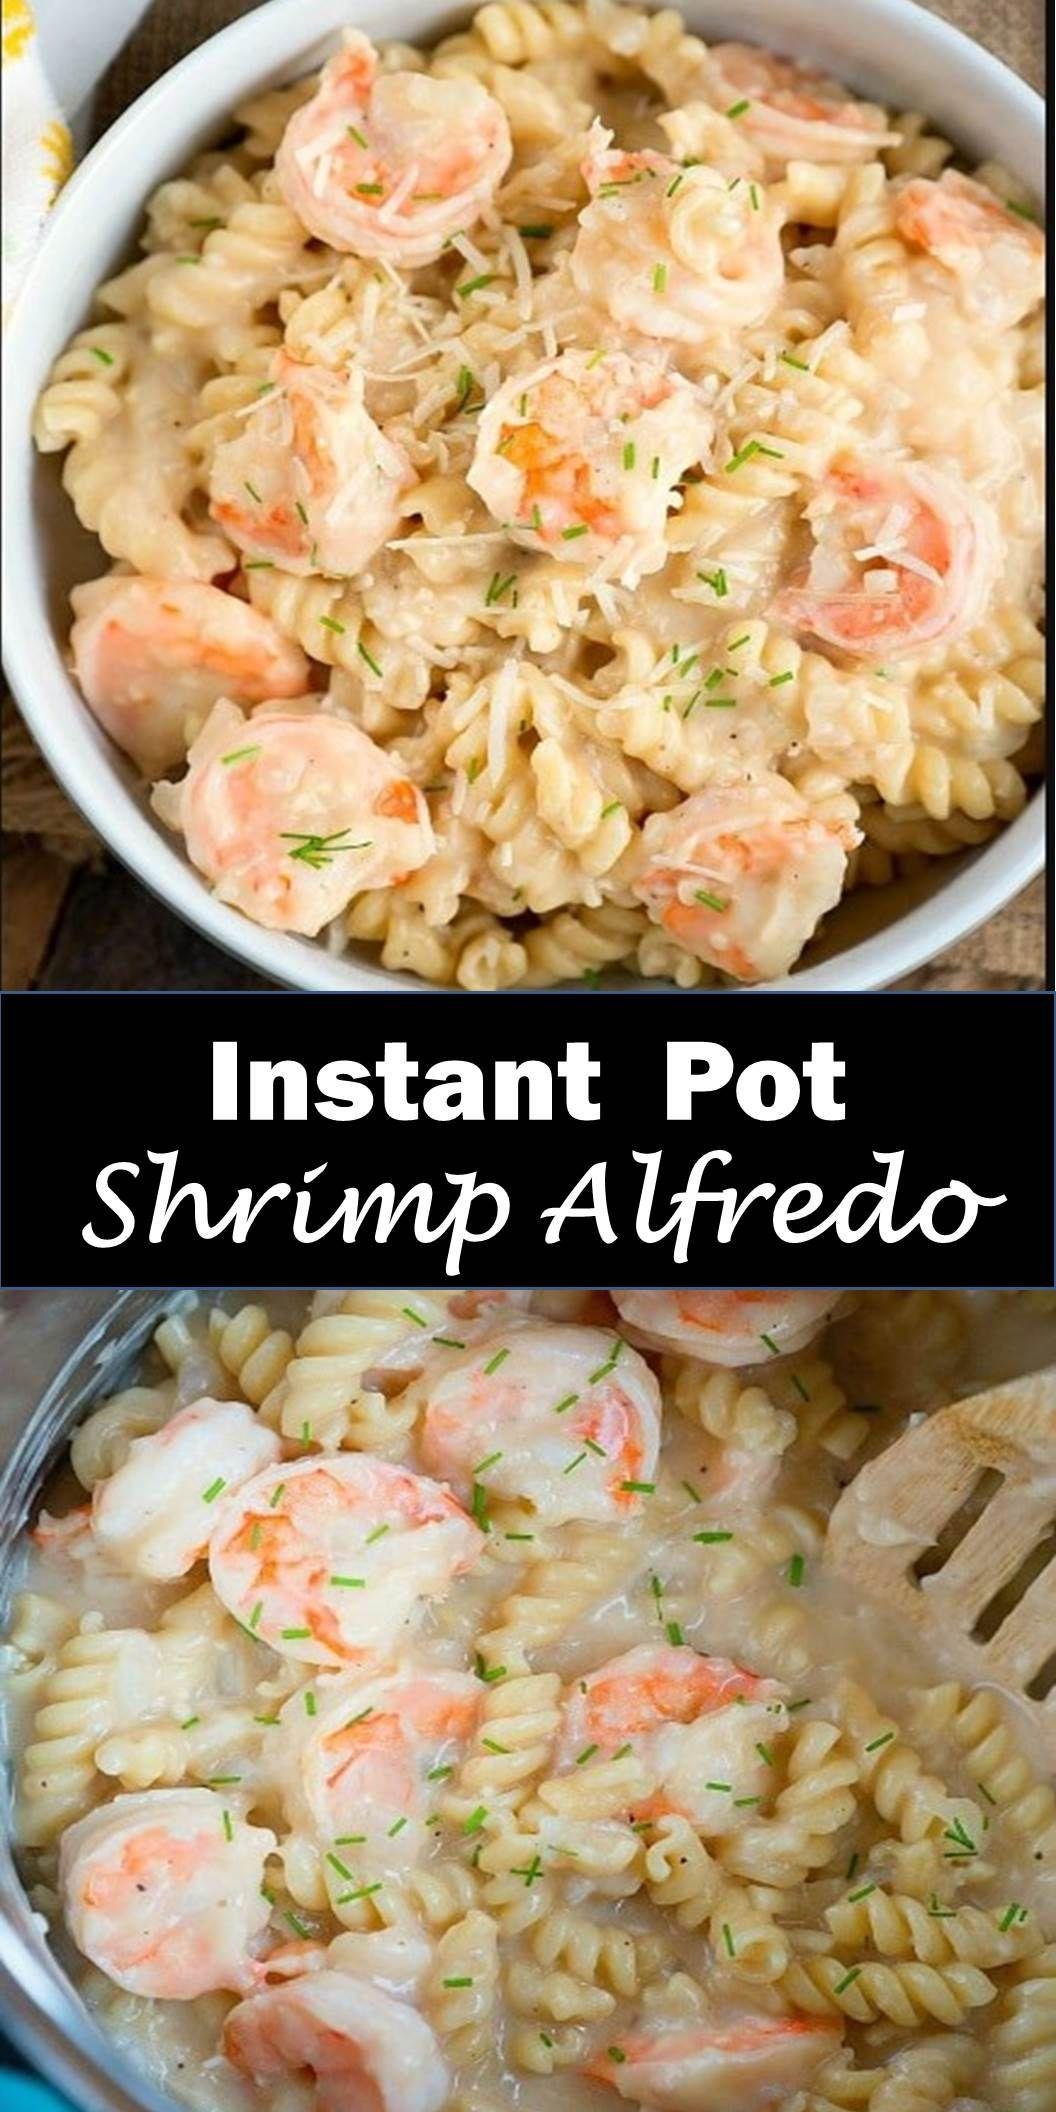 Photo of #Delicious #Food #Instant #Pot #Shrimp #Alfredo Delicious and healthy